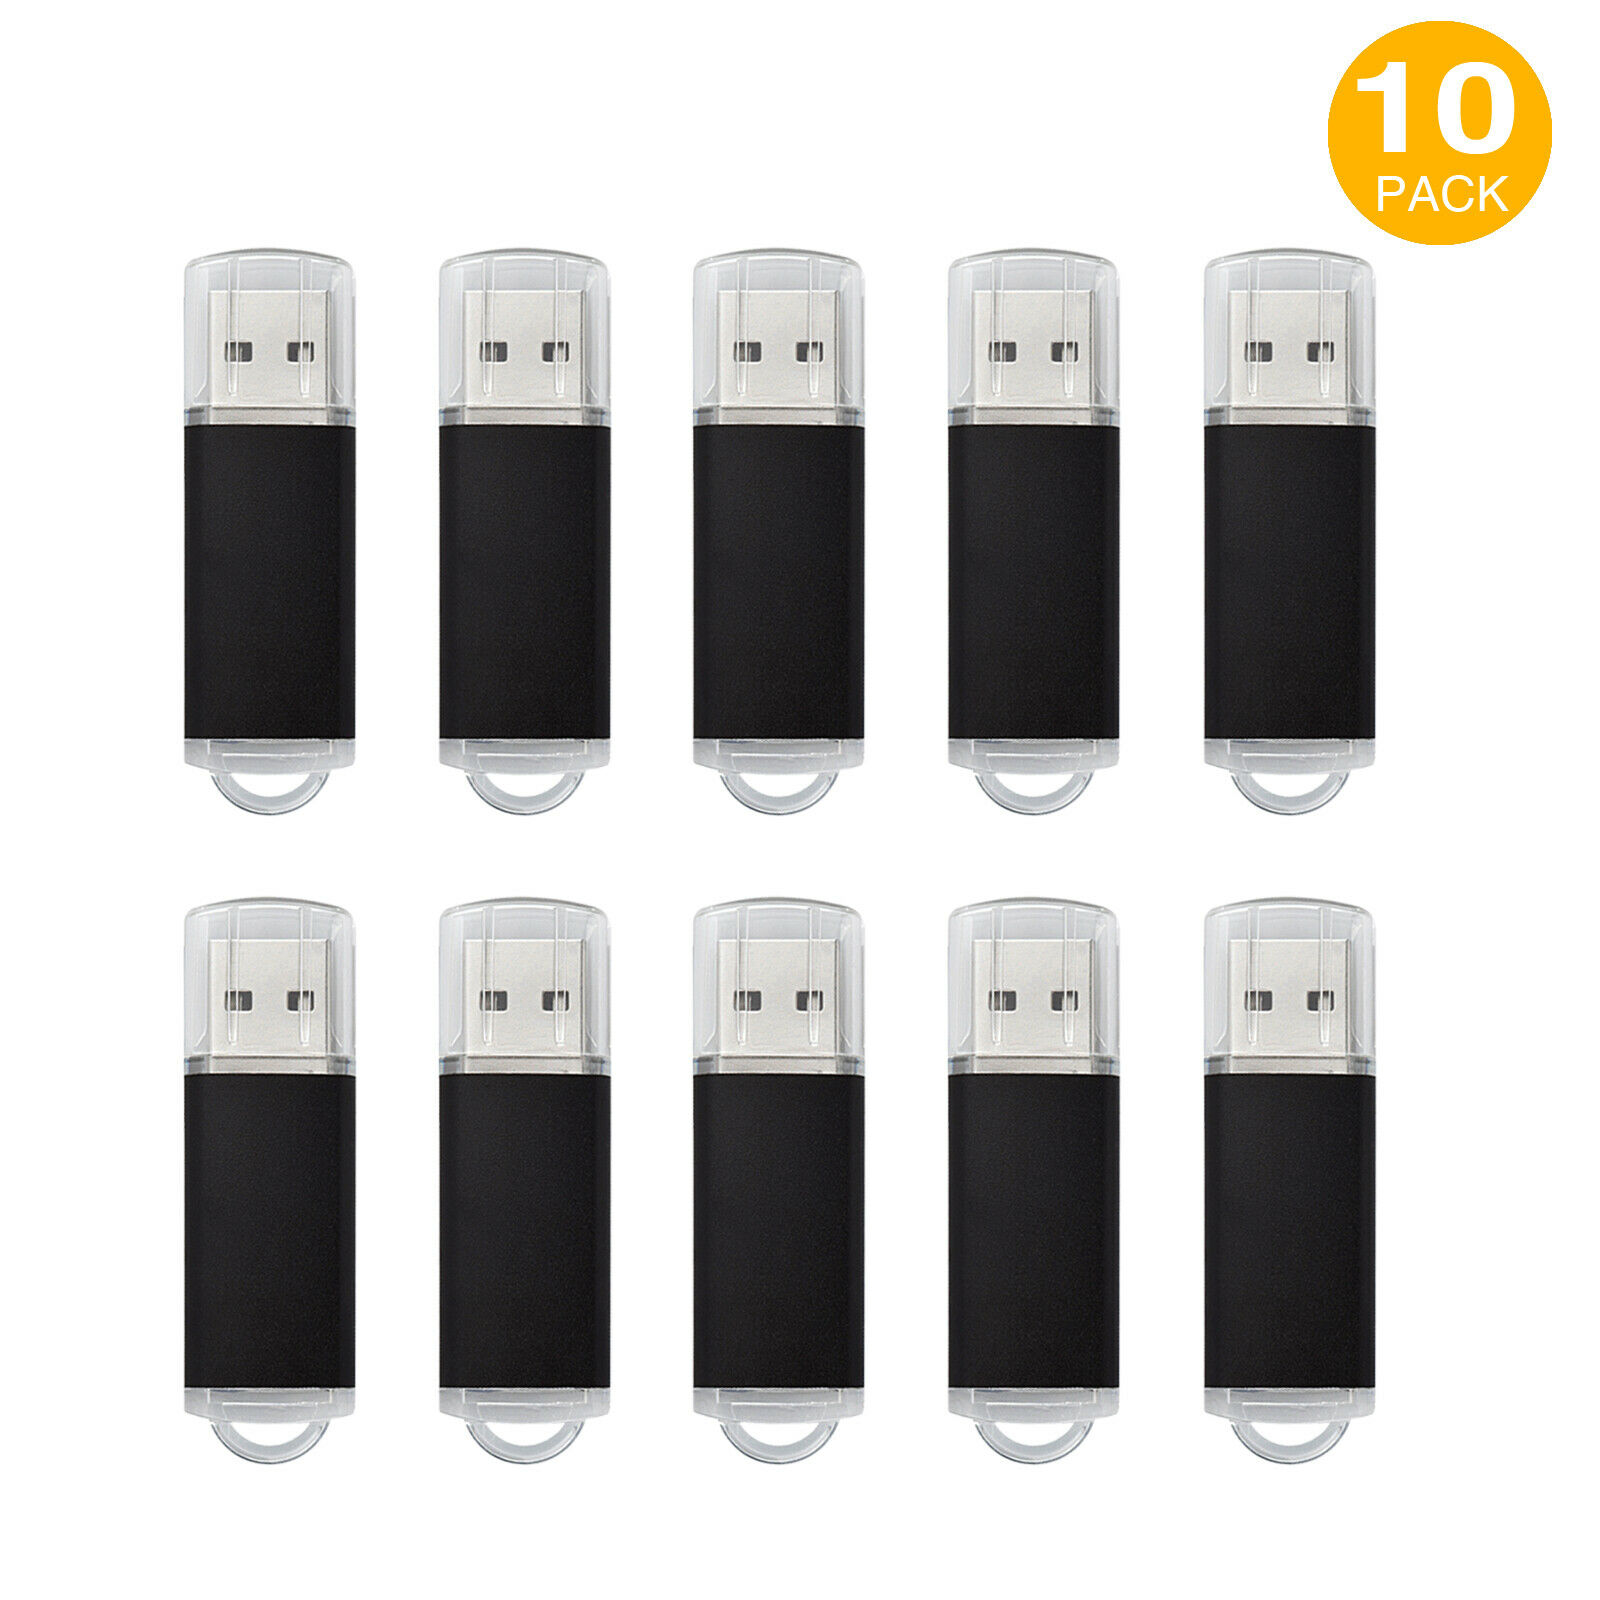 10Pack 1G 2G 4G 8G 16G USB Flash Drive Memory Stick Rectangle Thumb Pen Storage 126